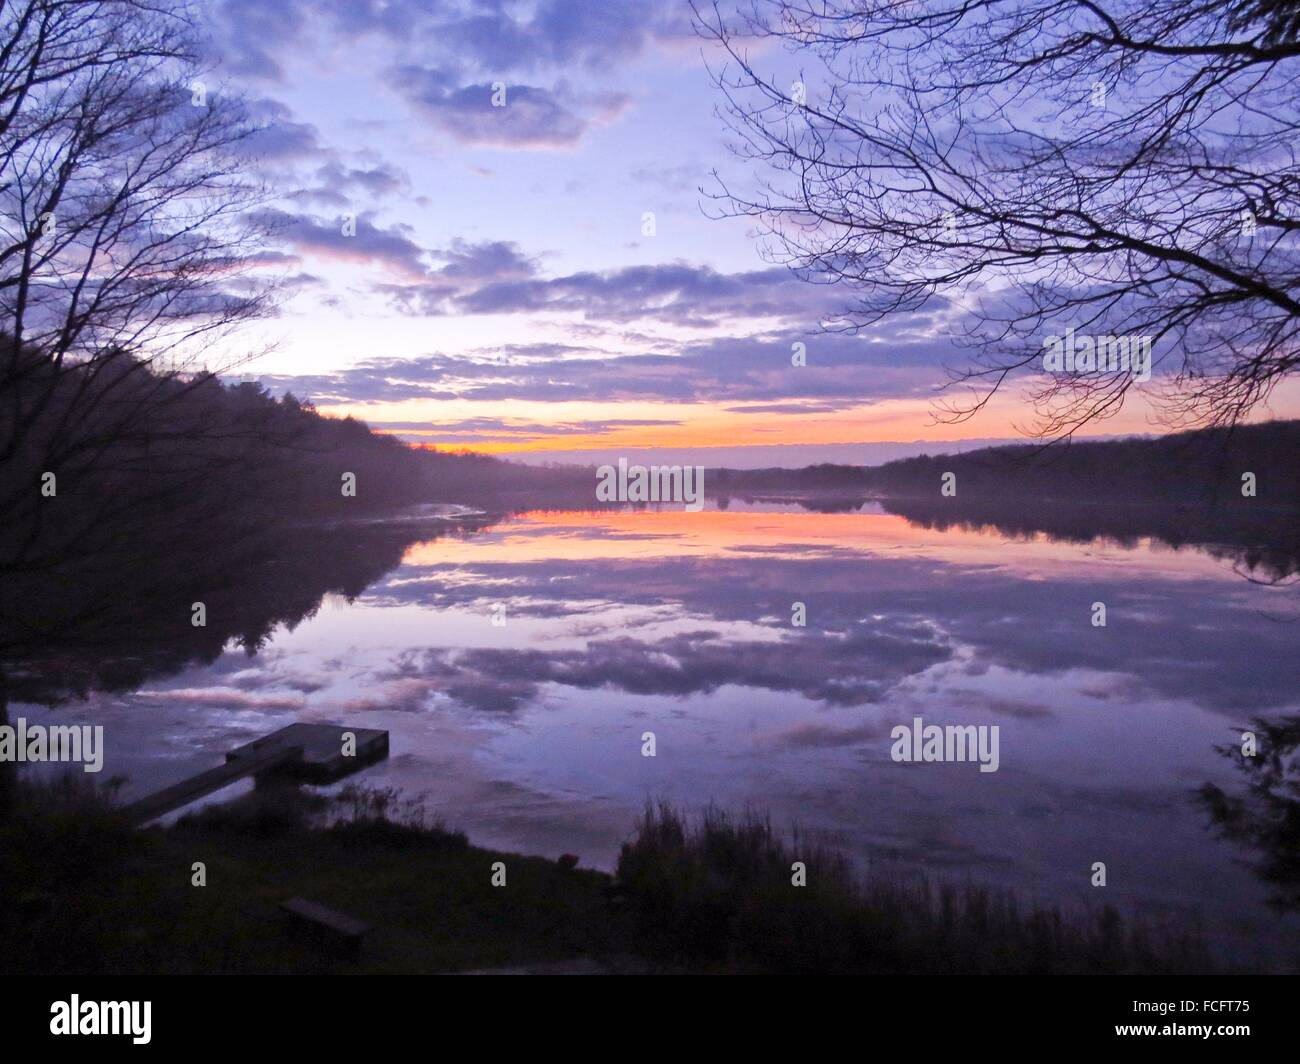 Serenity on lake - Stock Image